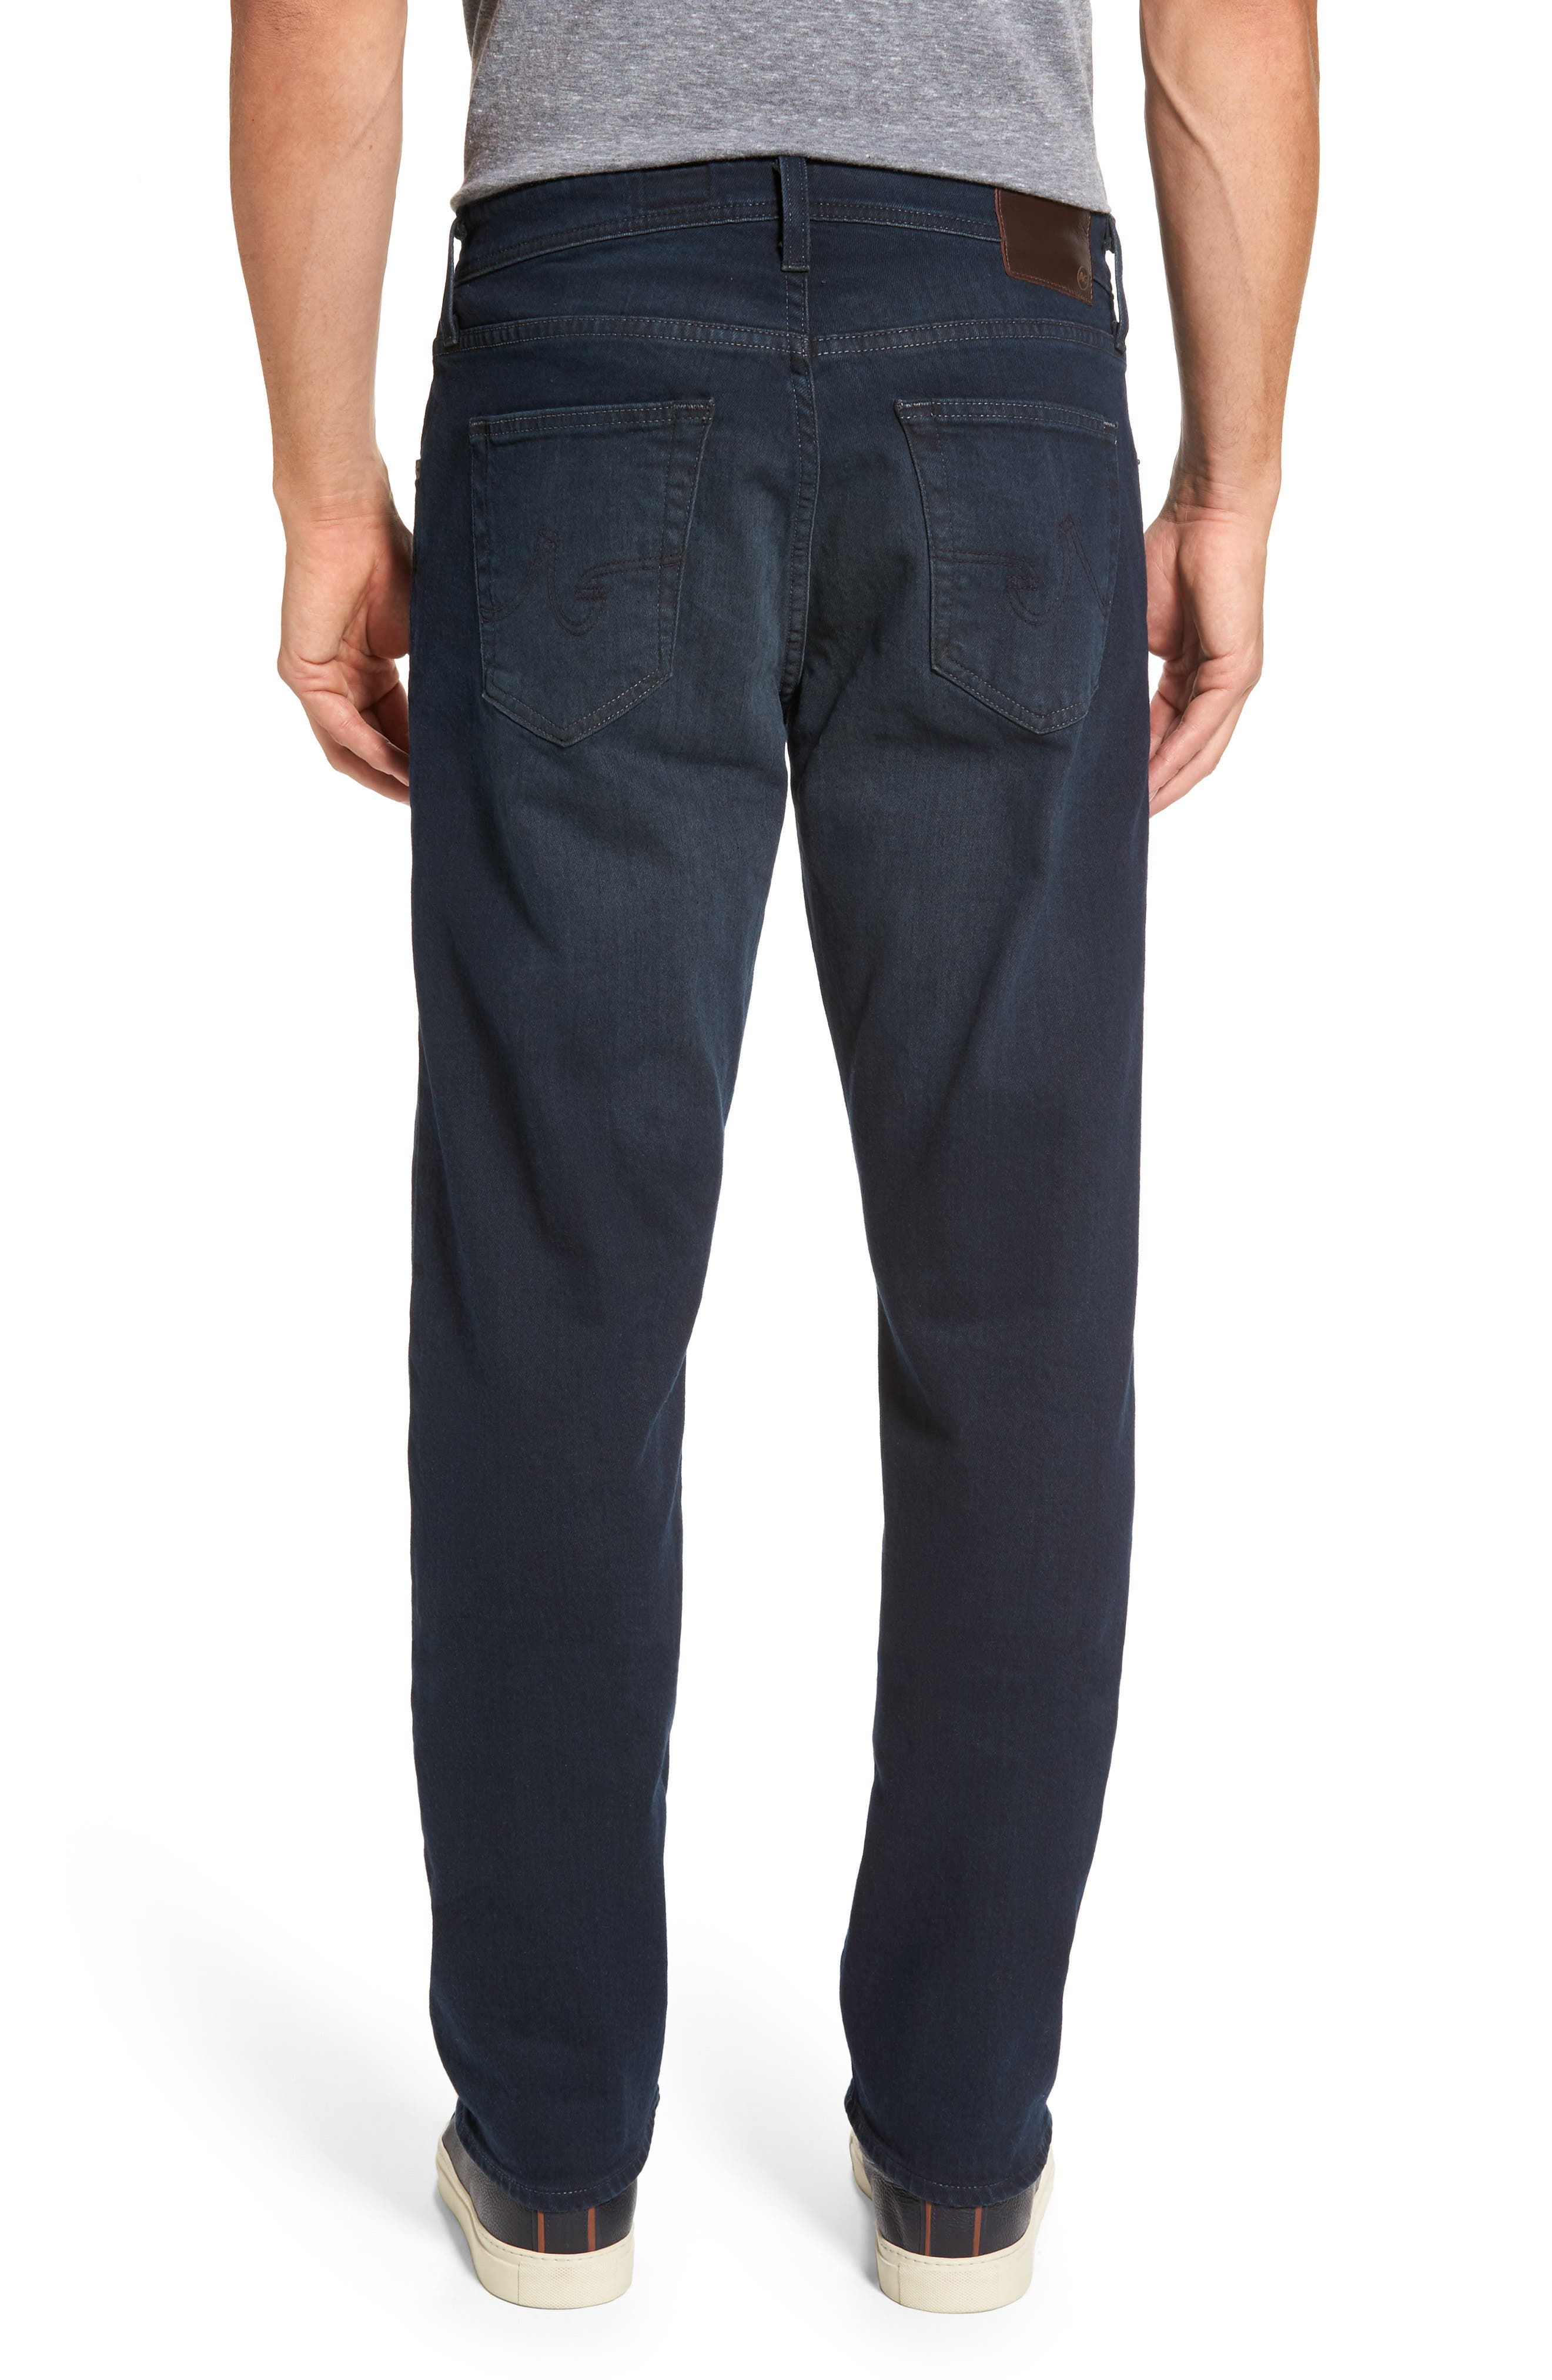 Ives Straight Fit Jeans,                             Alternate thumbnail 2, color,                             Blue Smolder